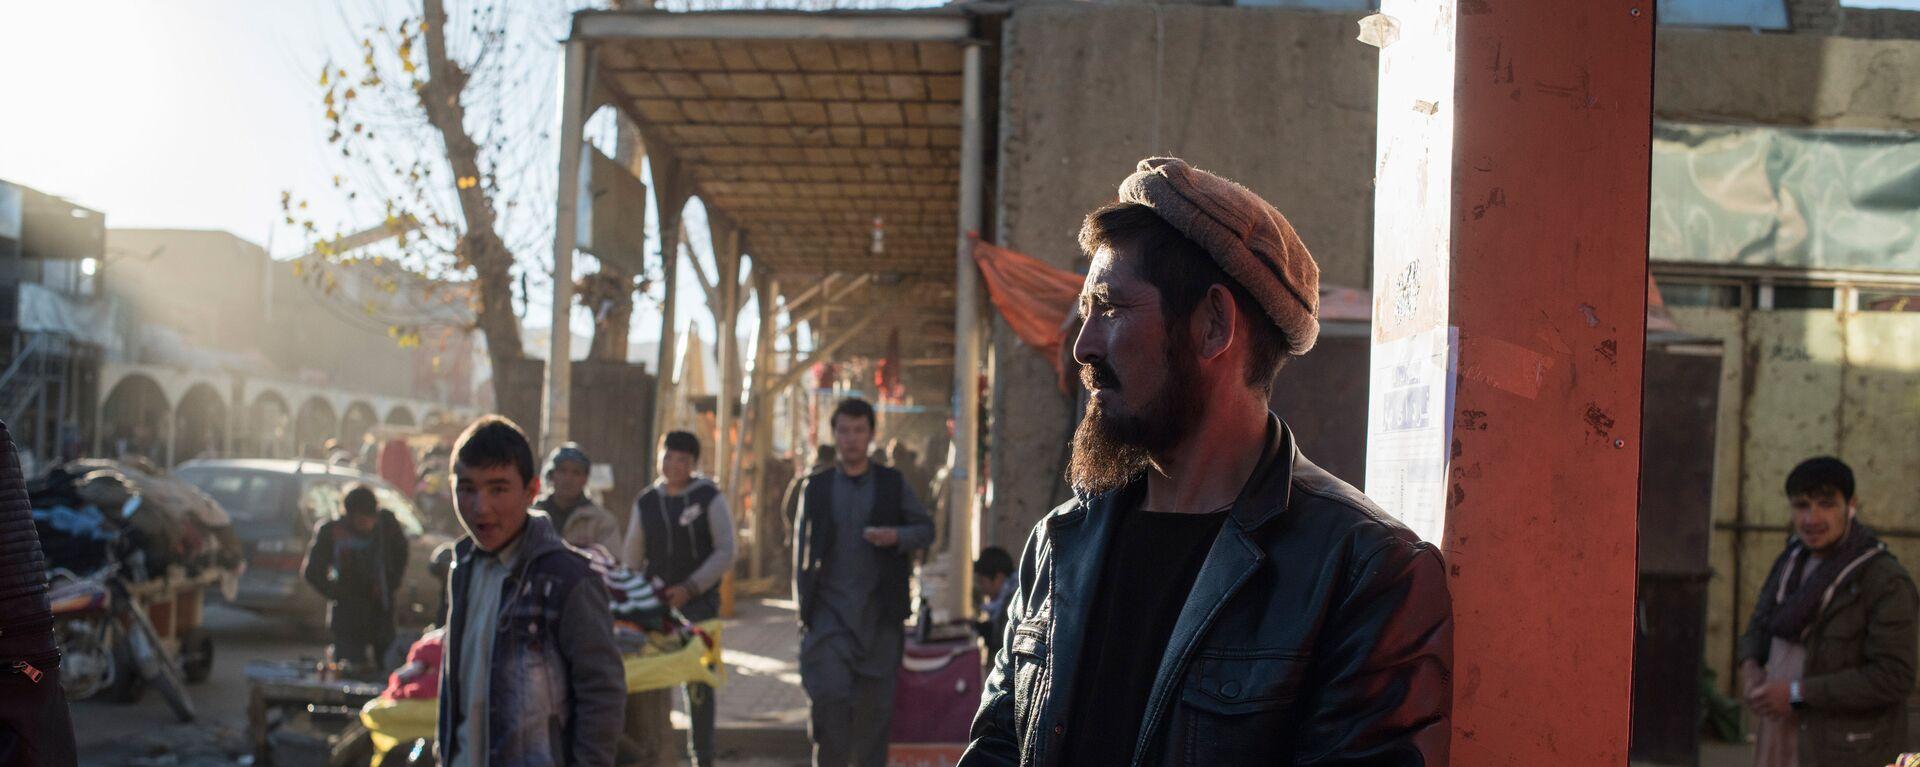 Жители Афганистана, архивное фото - Sputnik Таджикистан, 1920, 13.09.2021